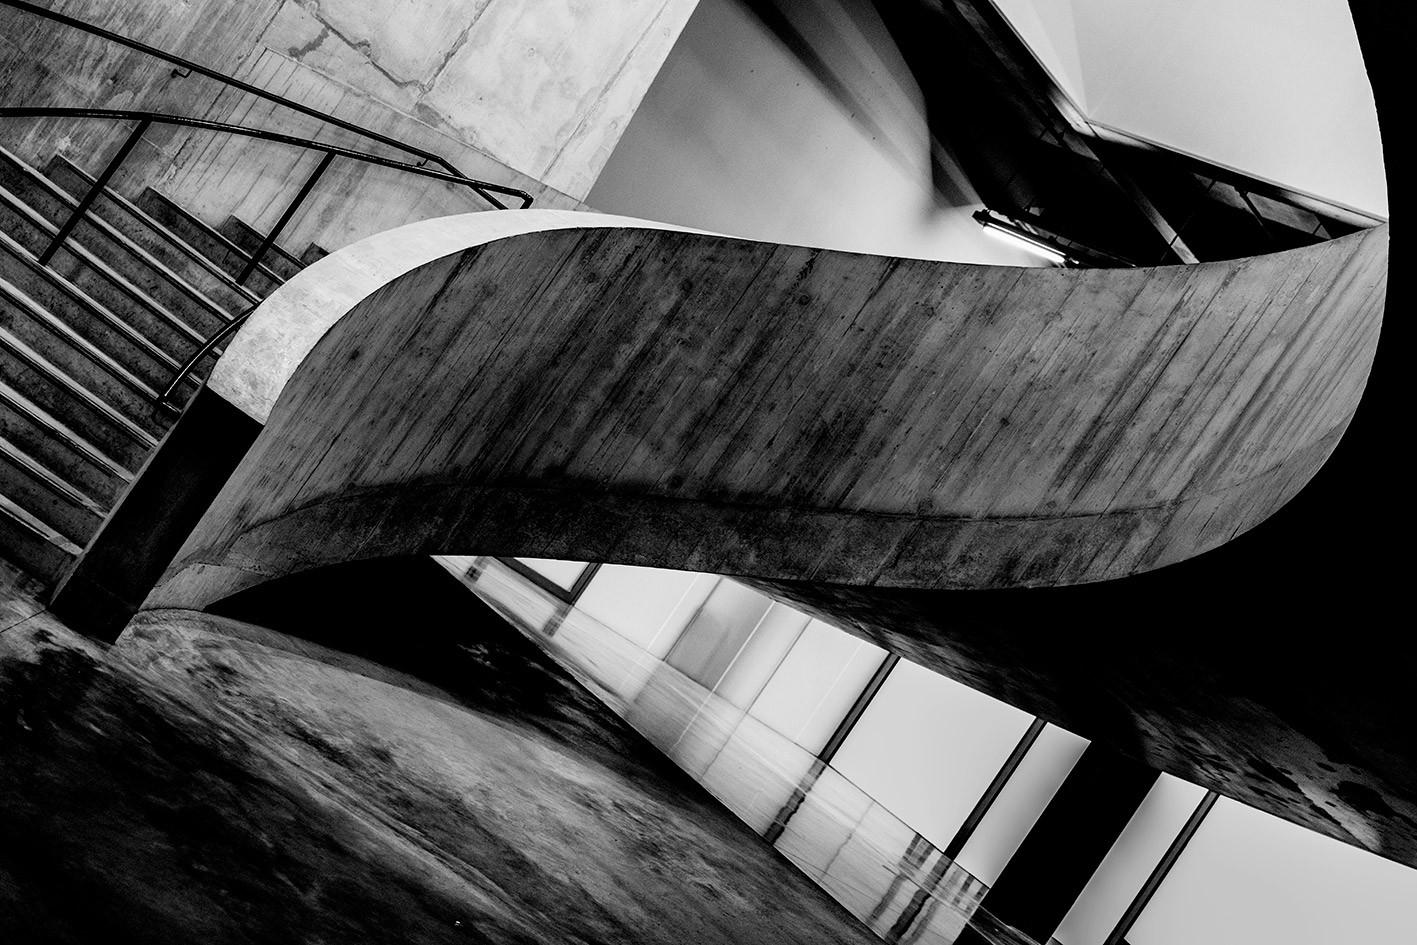 Tate Modern #11